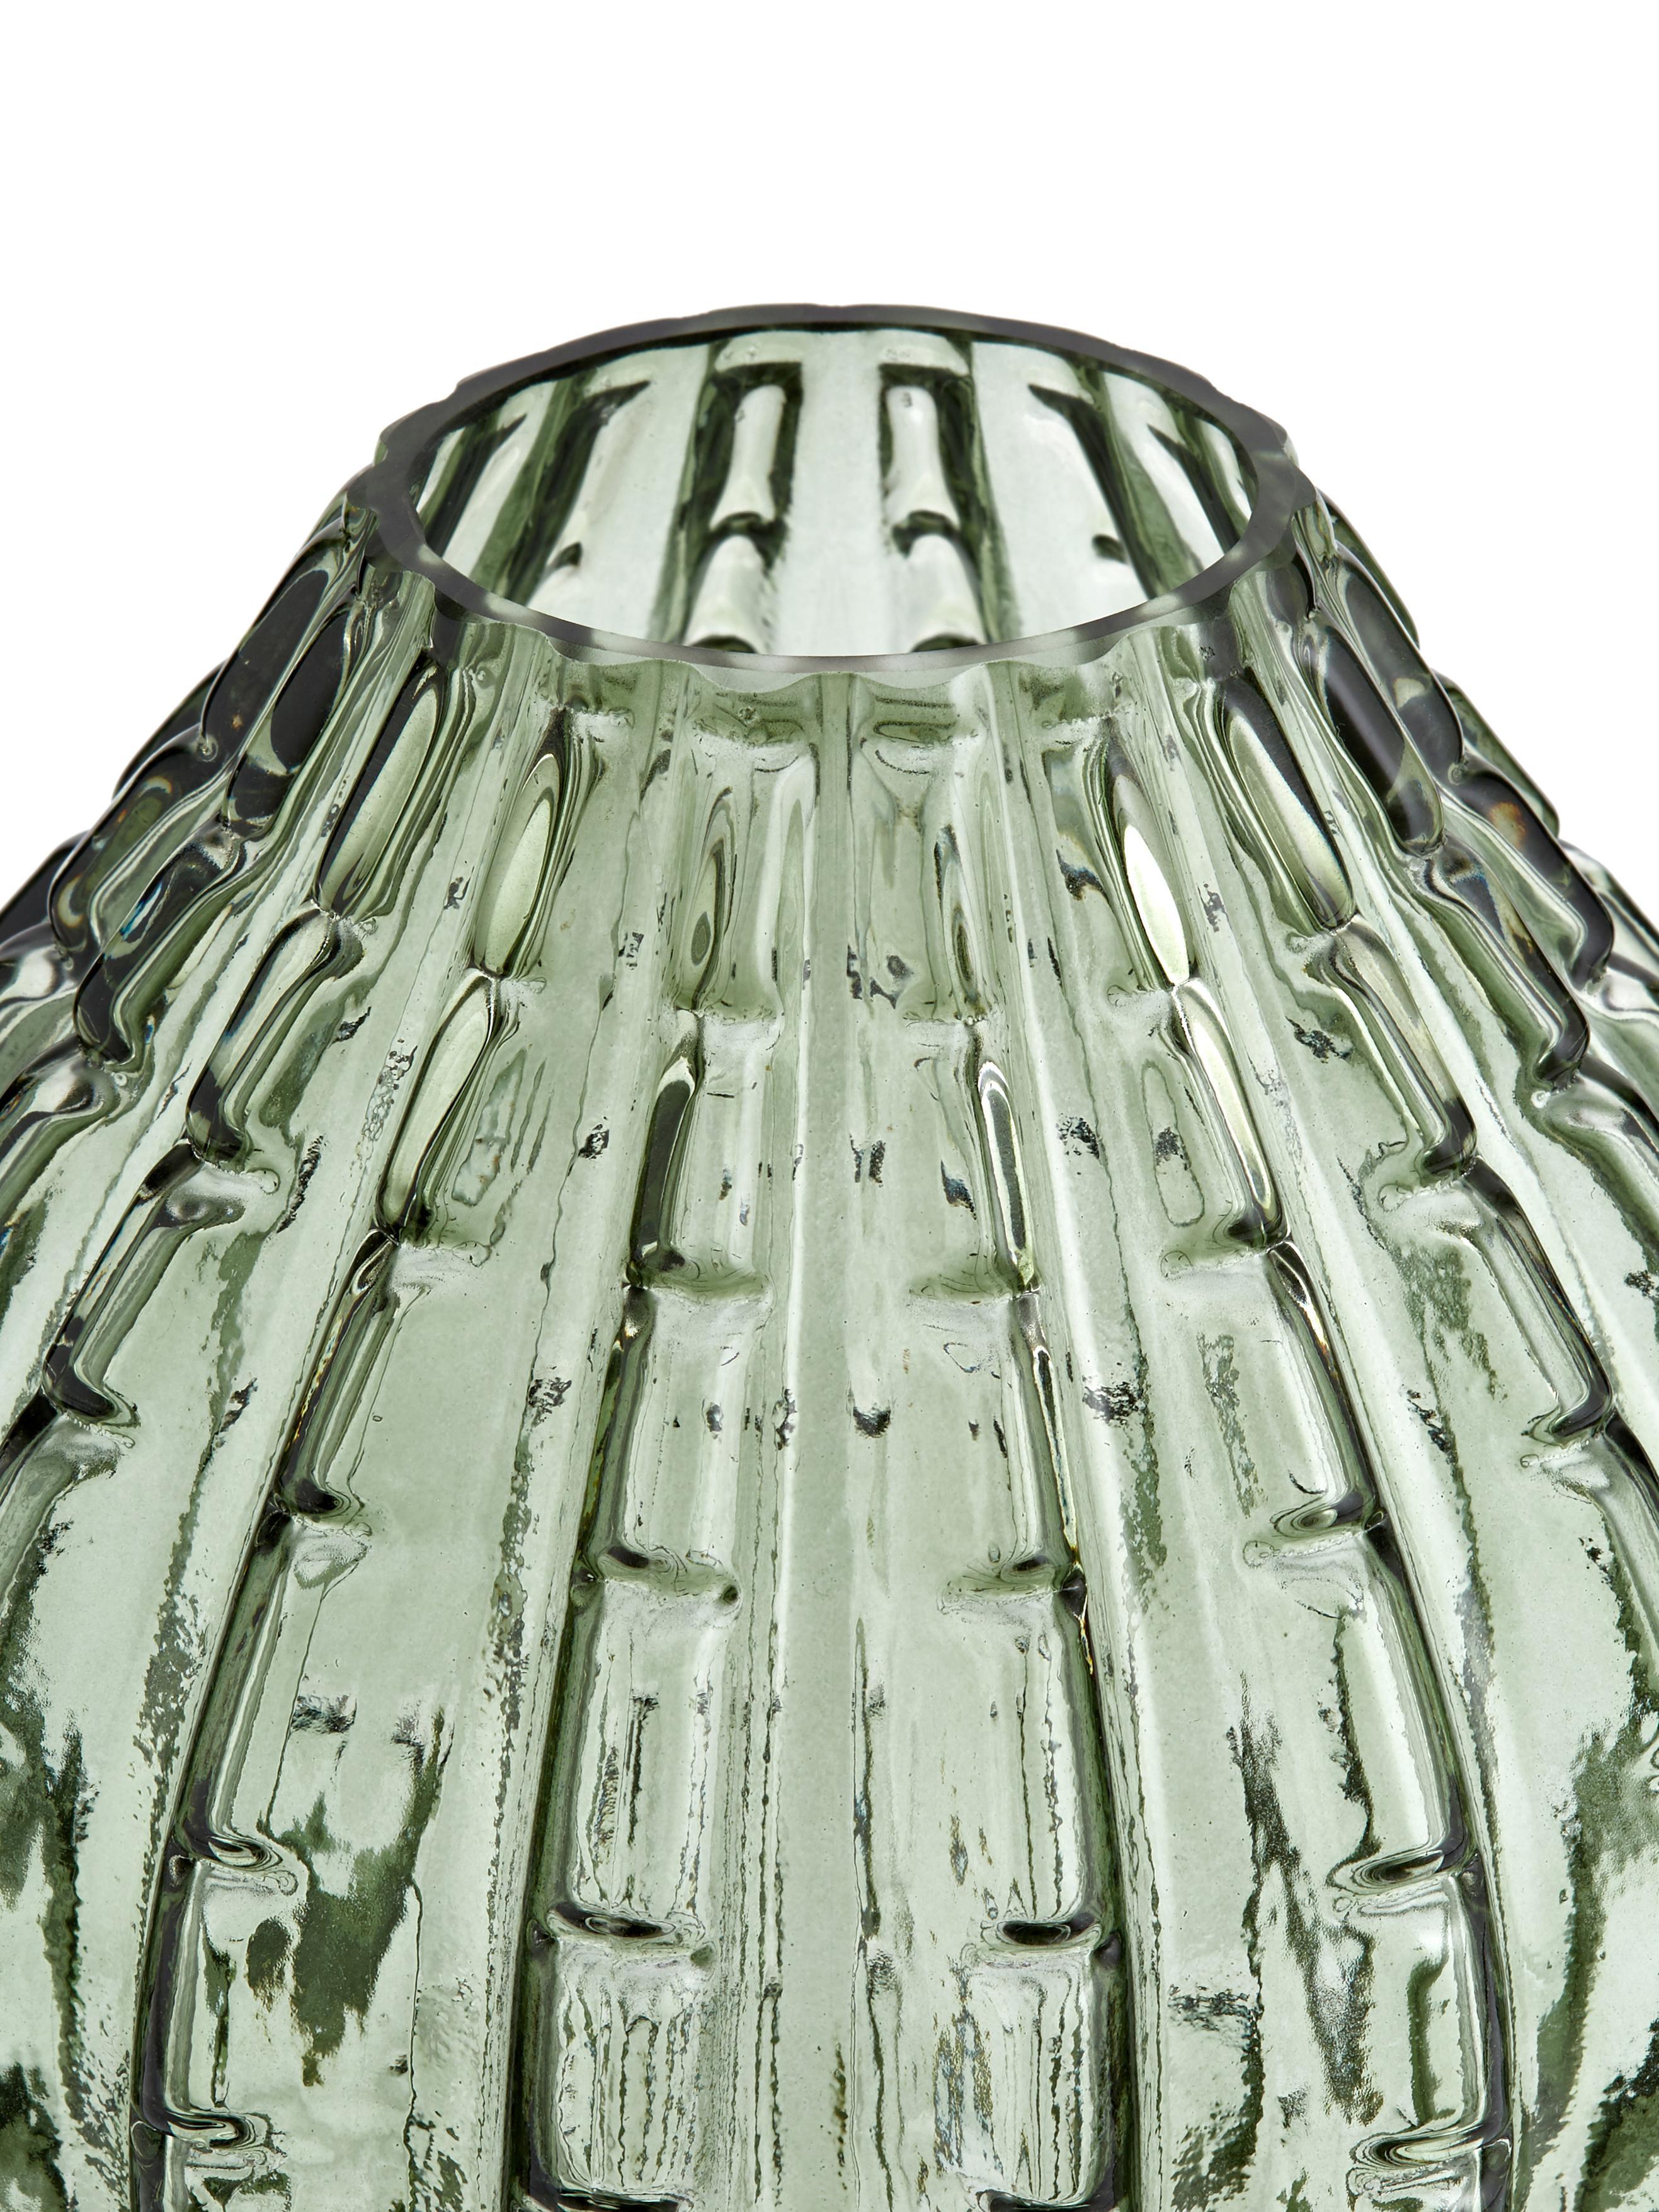 Glas-Vase Lioba in Grün, Glas, Grün, Ø 15 x H 17 cm